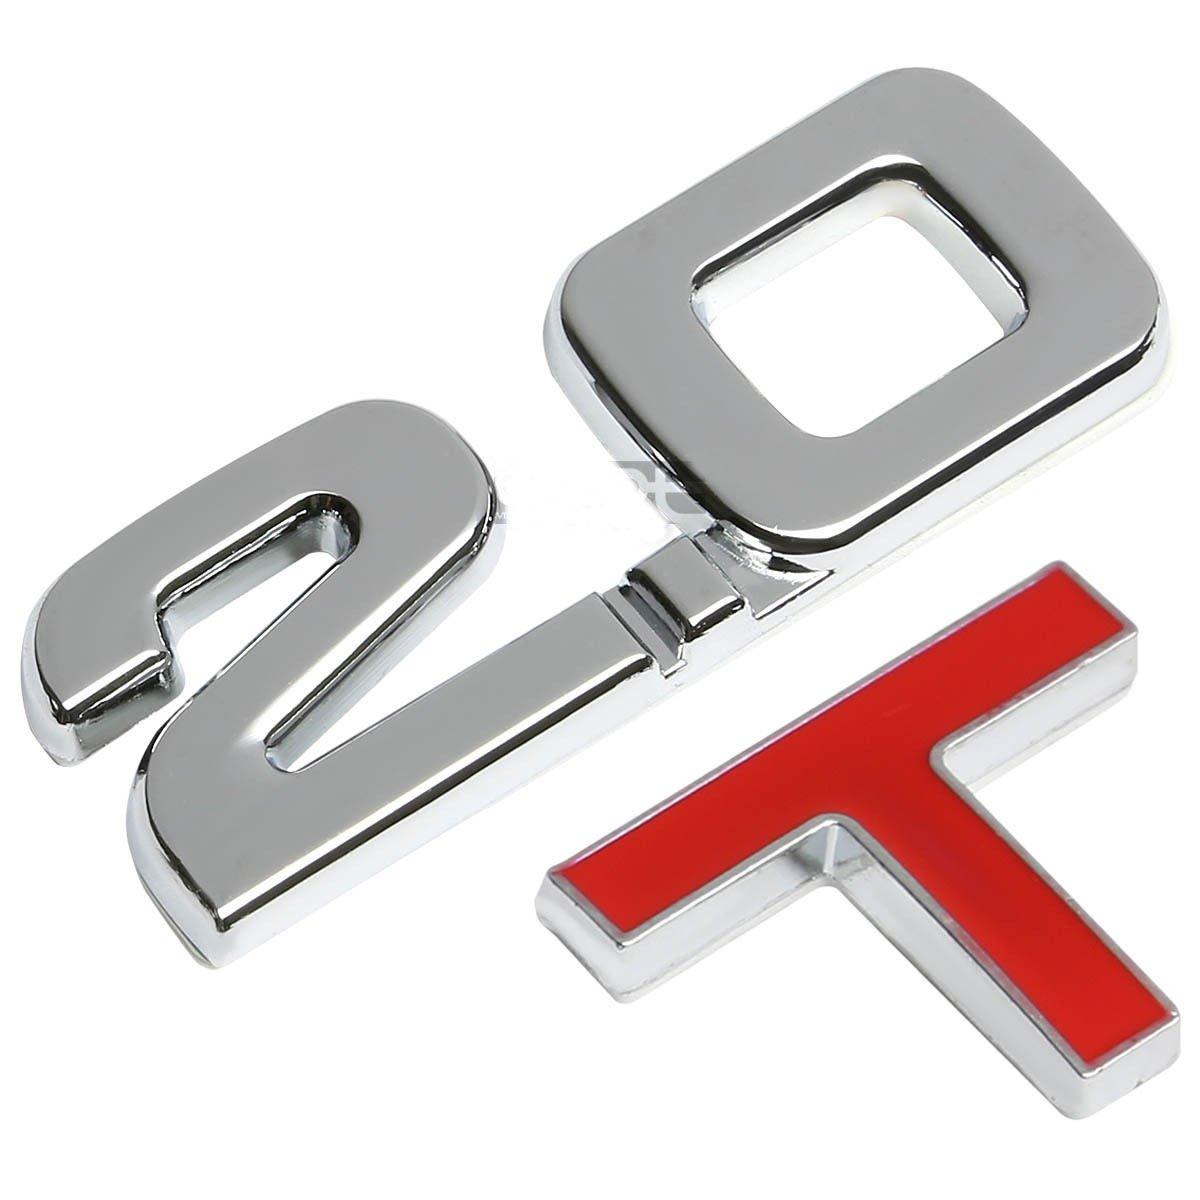 eforcar 2pcs bumper sticker personnalis embl me decal chrome badge garniture polonais chrome. Black Bedroom Furniture Sets. Home Design Ideas